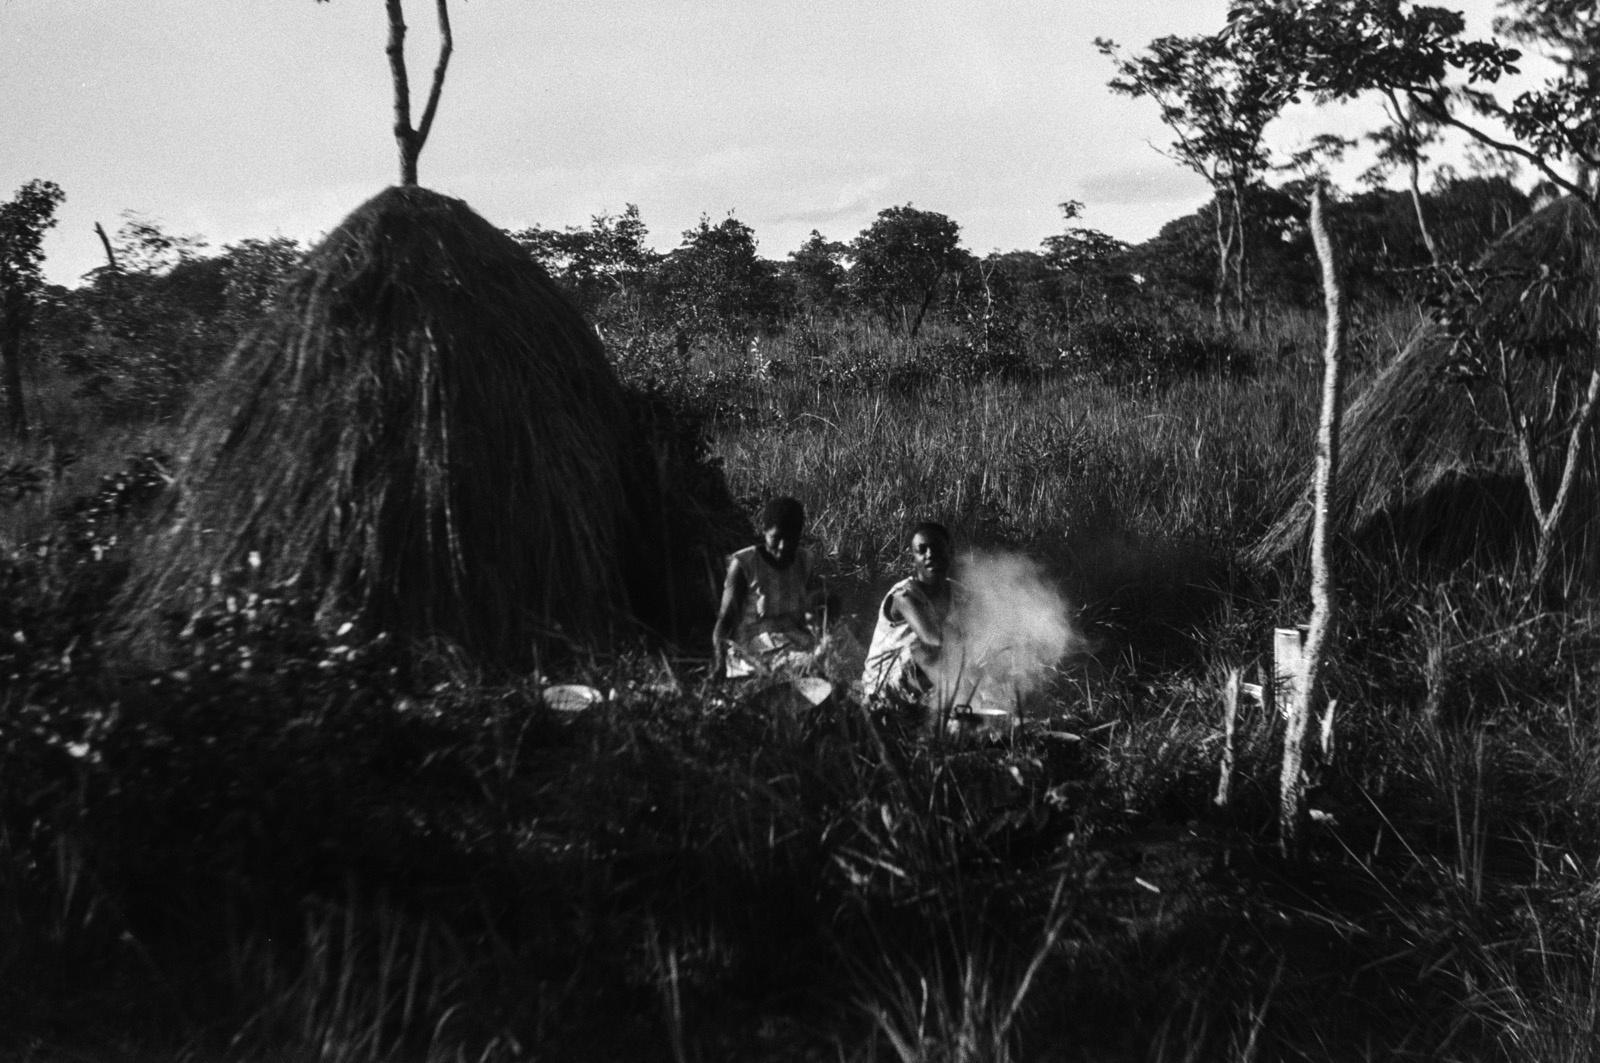 Капири Мпоши. Две женщины народности лунда за разведением костра